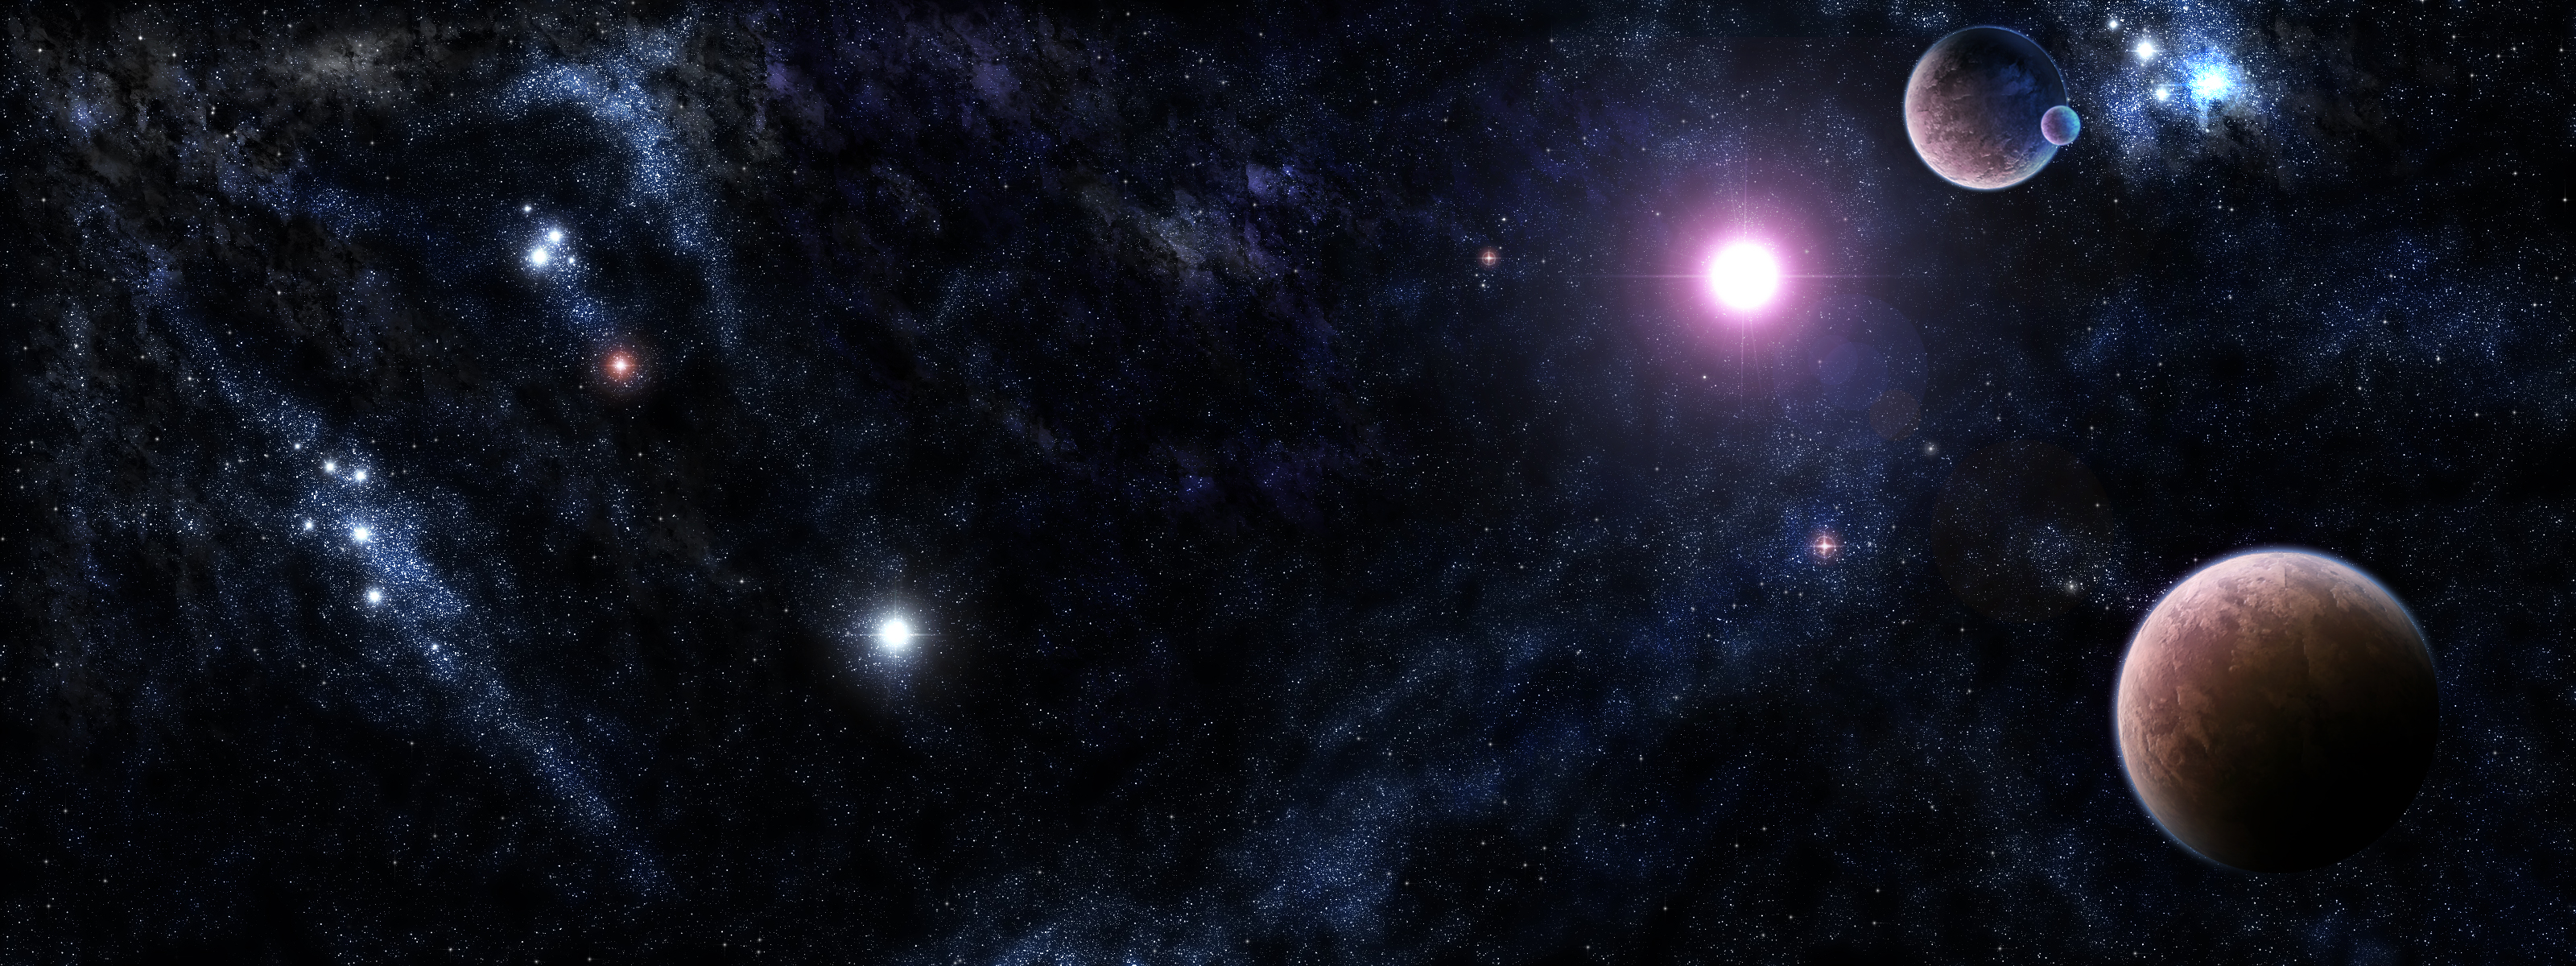 Multi Monitor dual screen sci fi planets stars nebula wallpaper 3200x1200